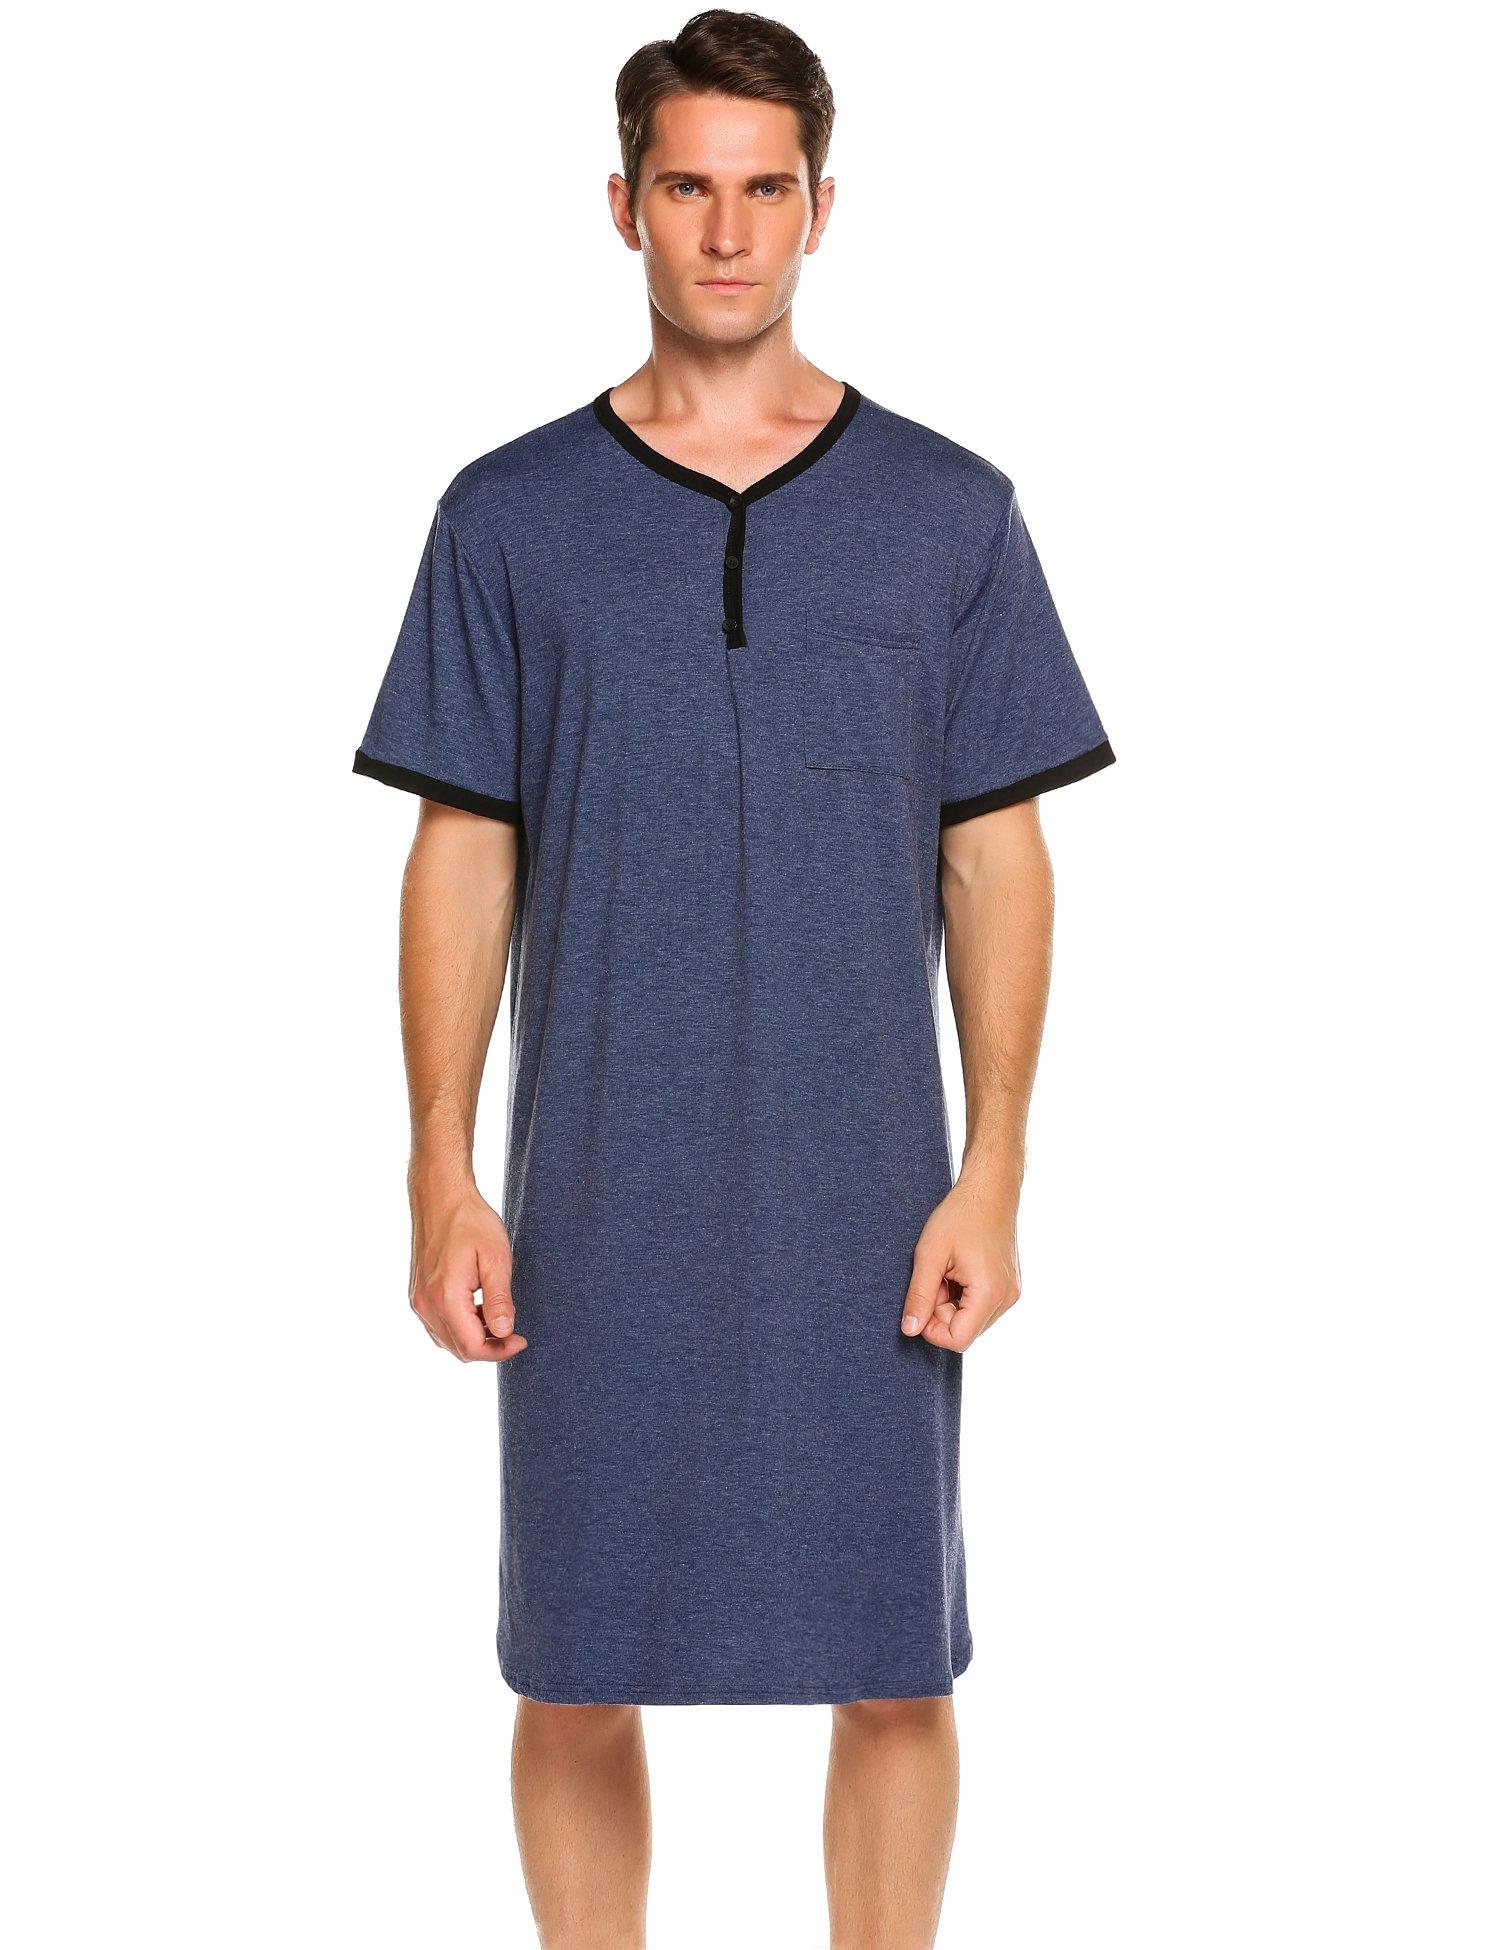 Ekouaer Men's Sleepwear Cotton Nightwear Kaftan Nightshirt (Blue, X-Large)